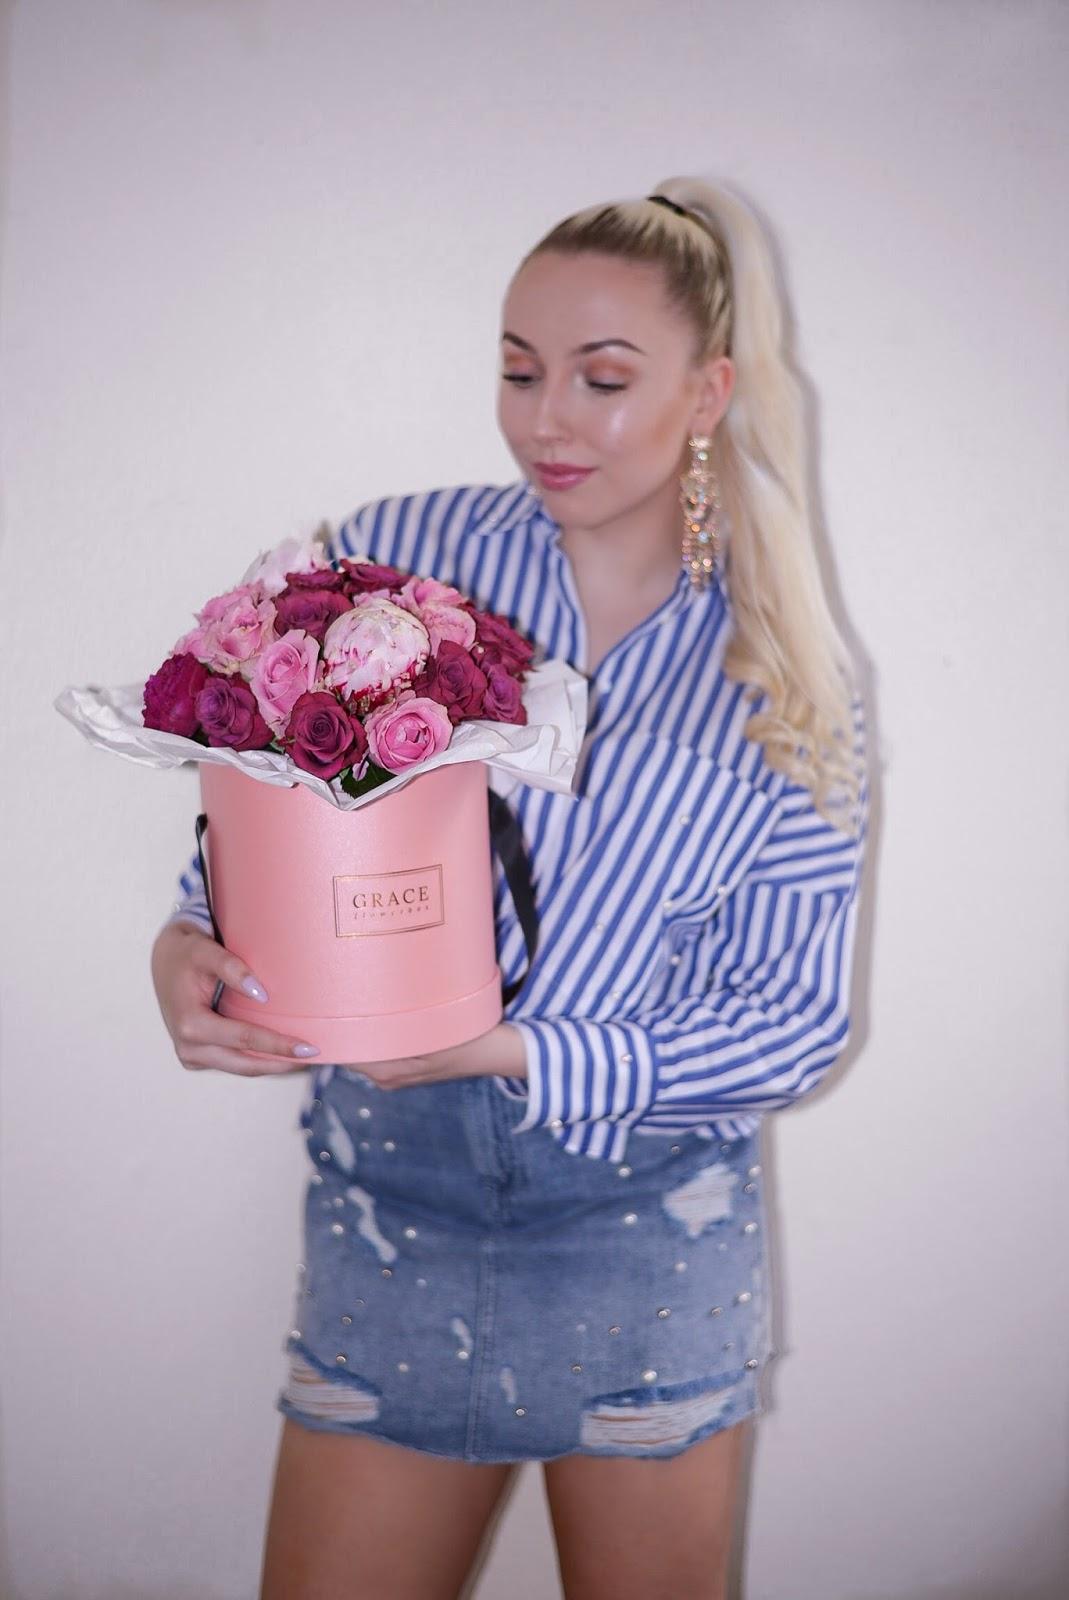 grace flowerbox_grace flowerbox bewertungen_flowerbox